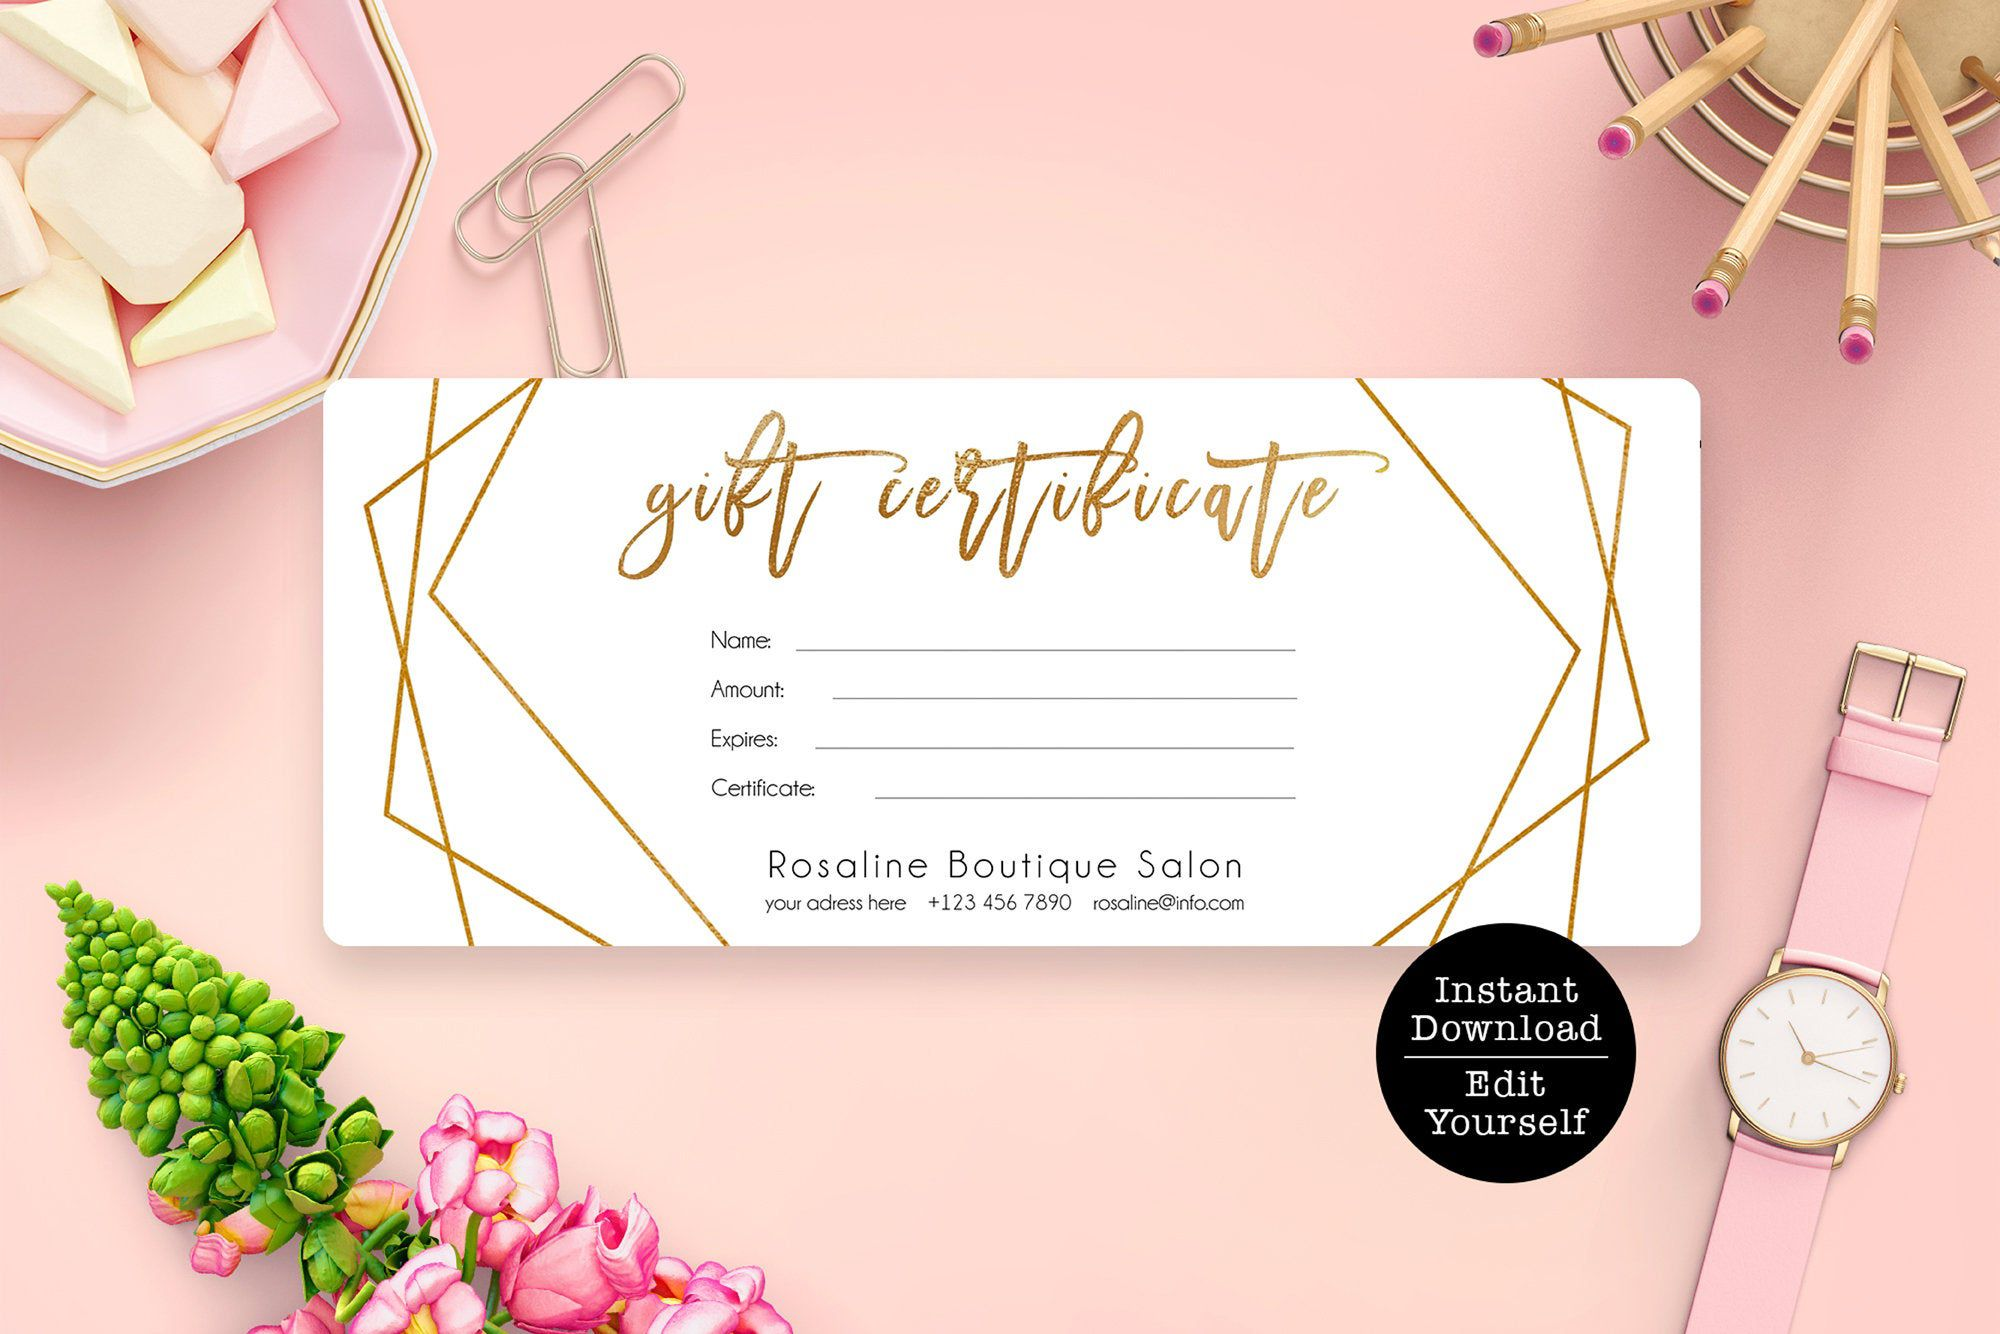 Editable Gift Certificate Template Geometric Gold Gift Card Etsy In 2021 Gift Card Template Gift Certificate Template Gift Card Design Free online gift certificate template